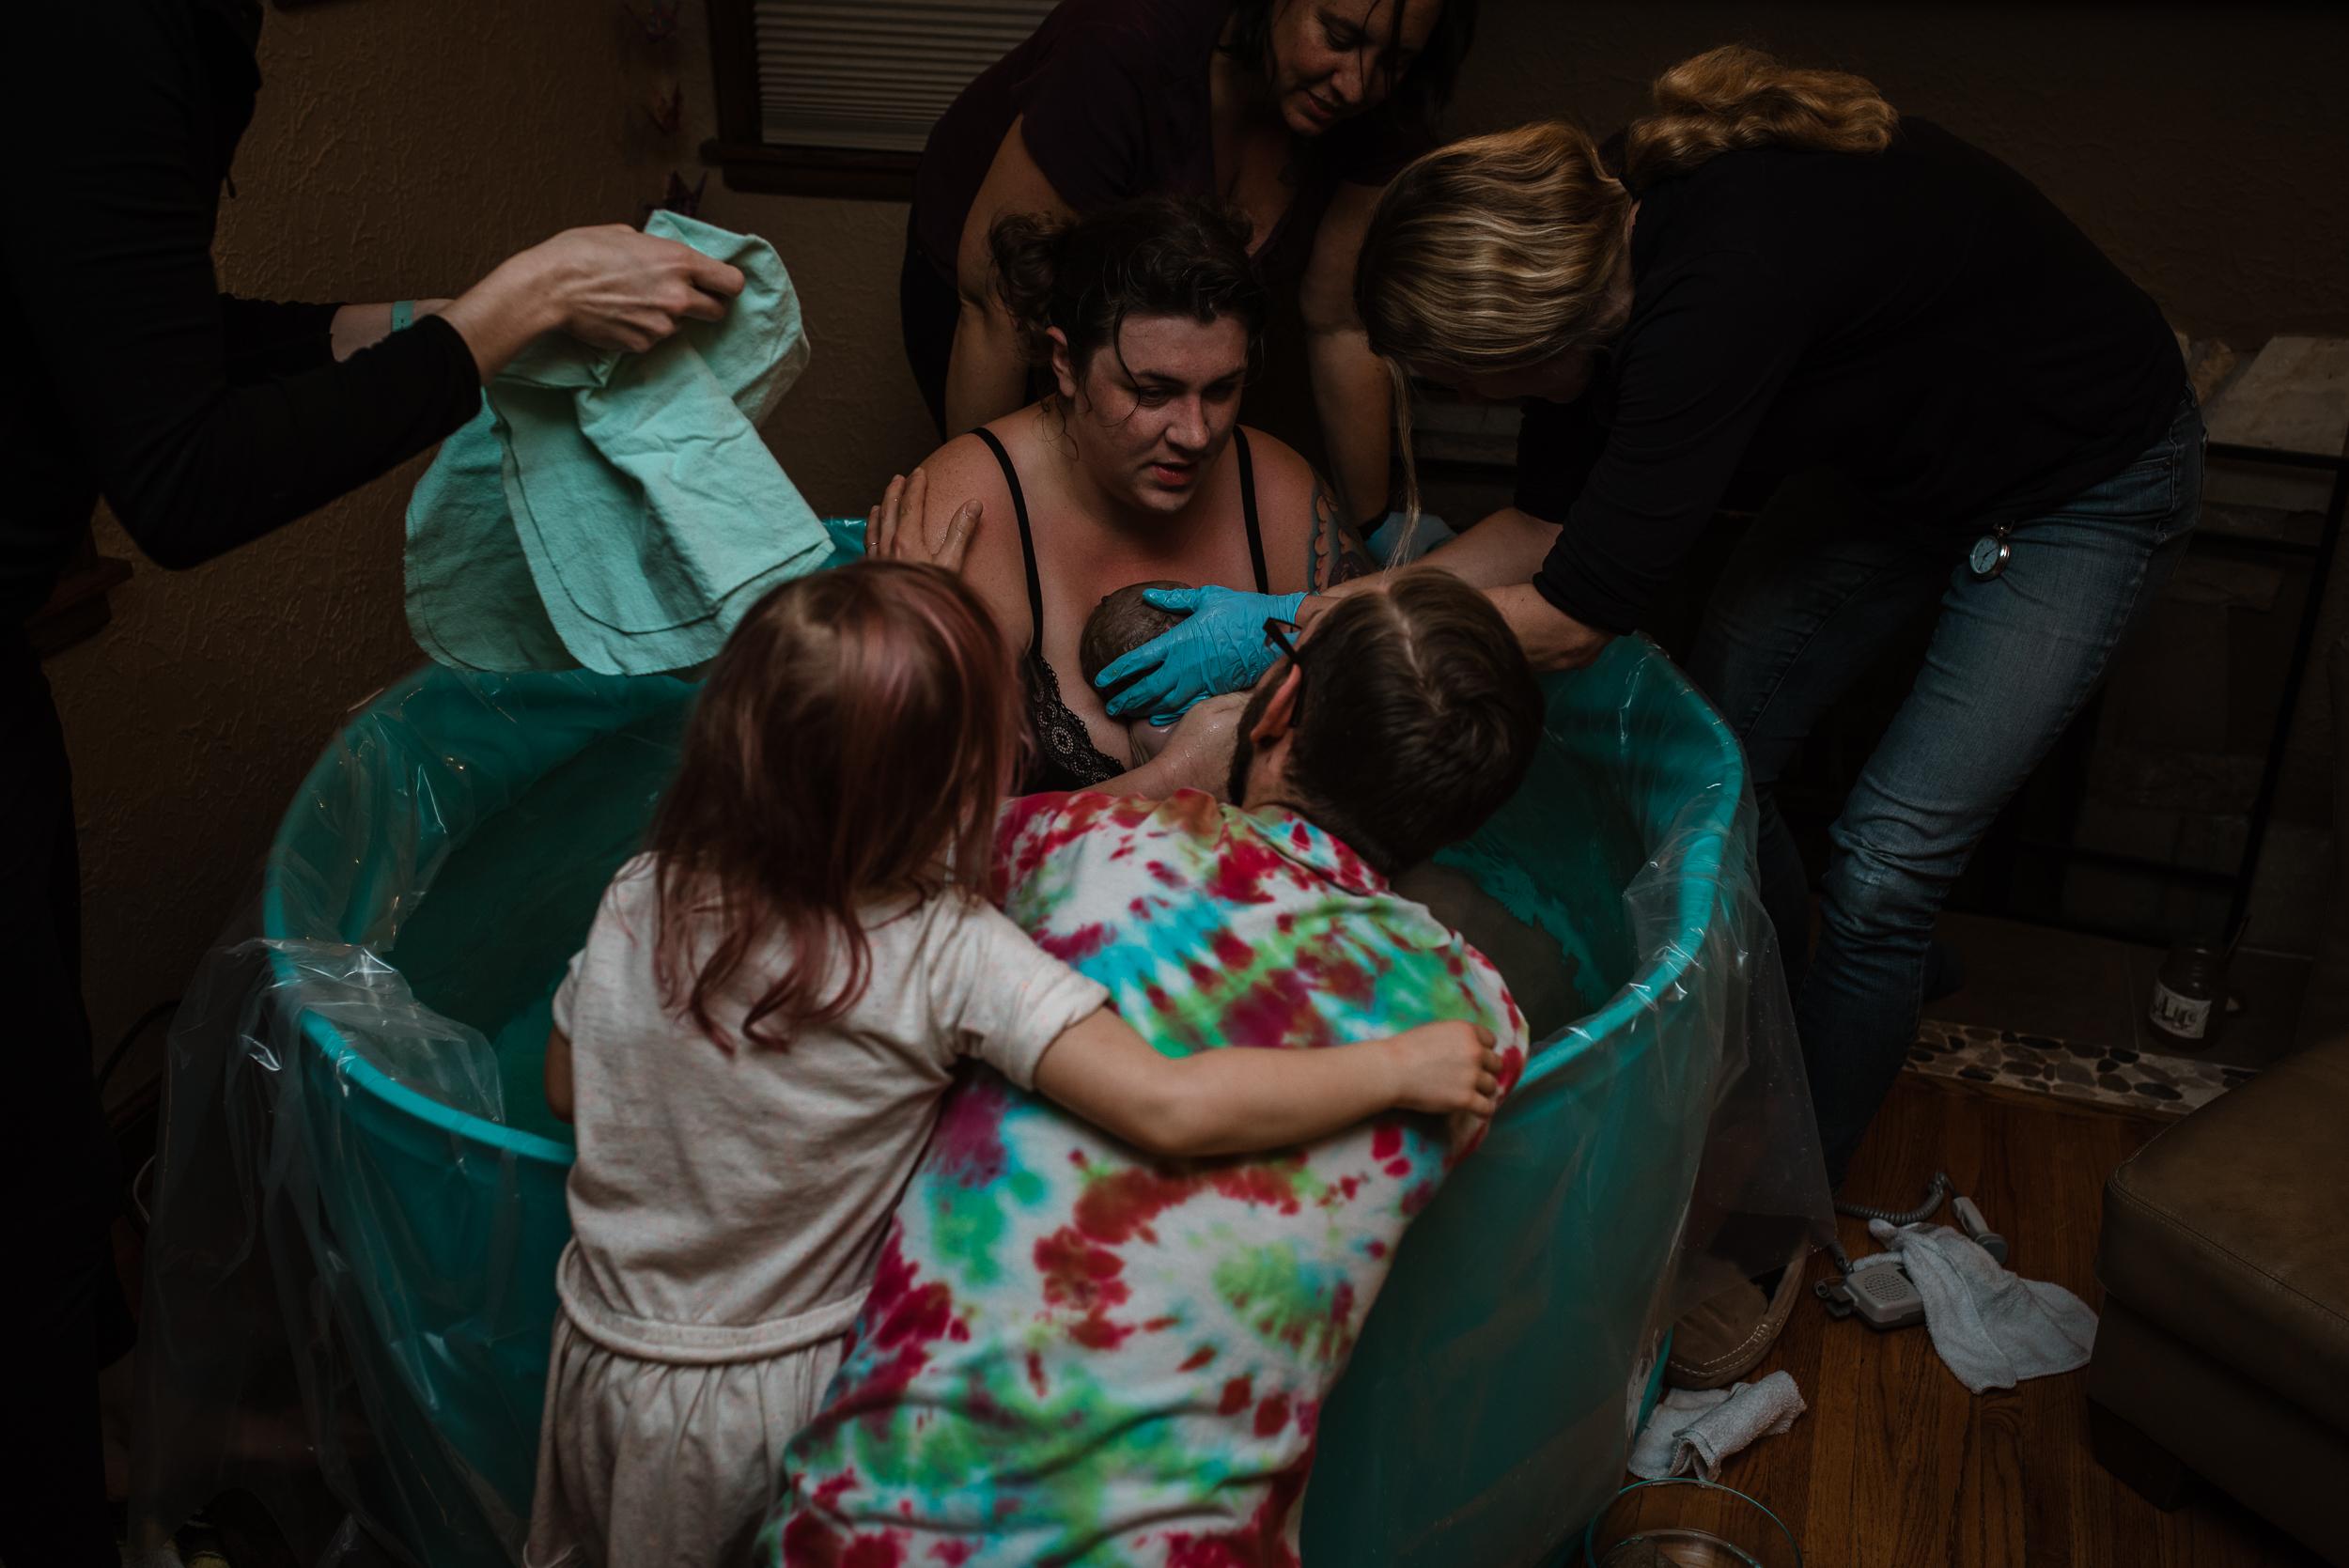 Meredith Westin Photography- Minneapolis Birth Stories and Films-November 08, 2018-190107.jpg